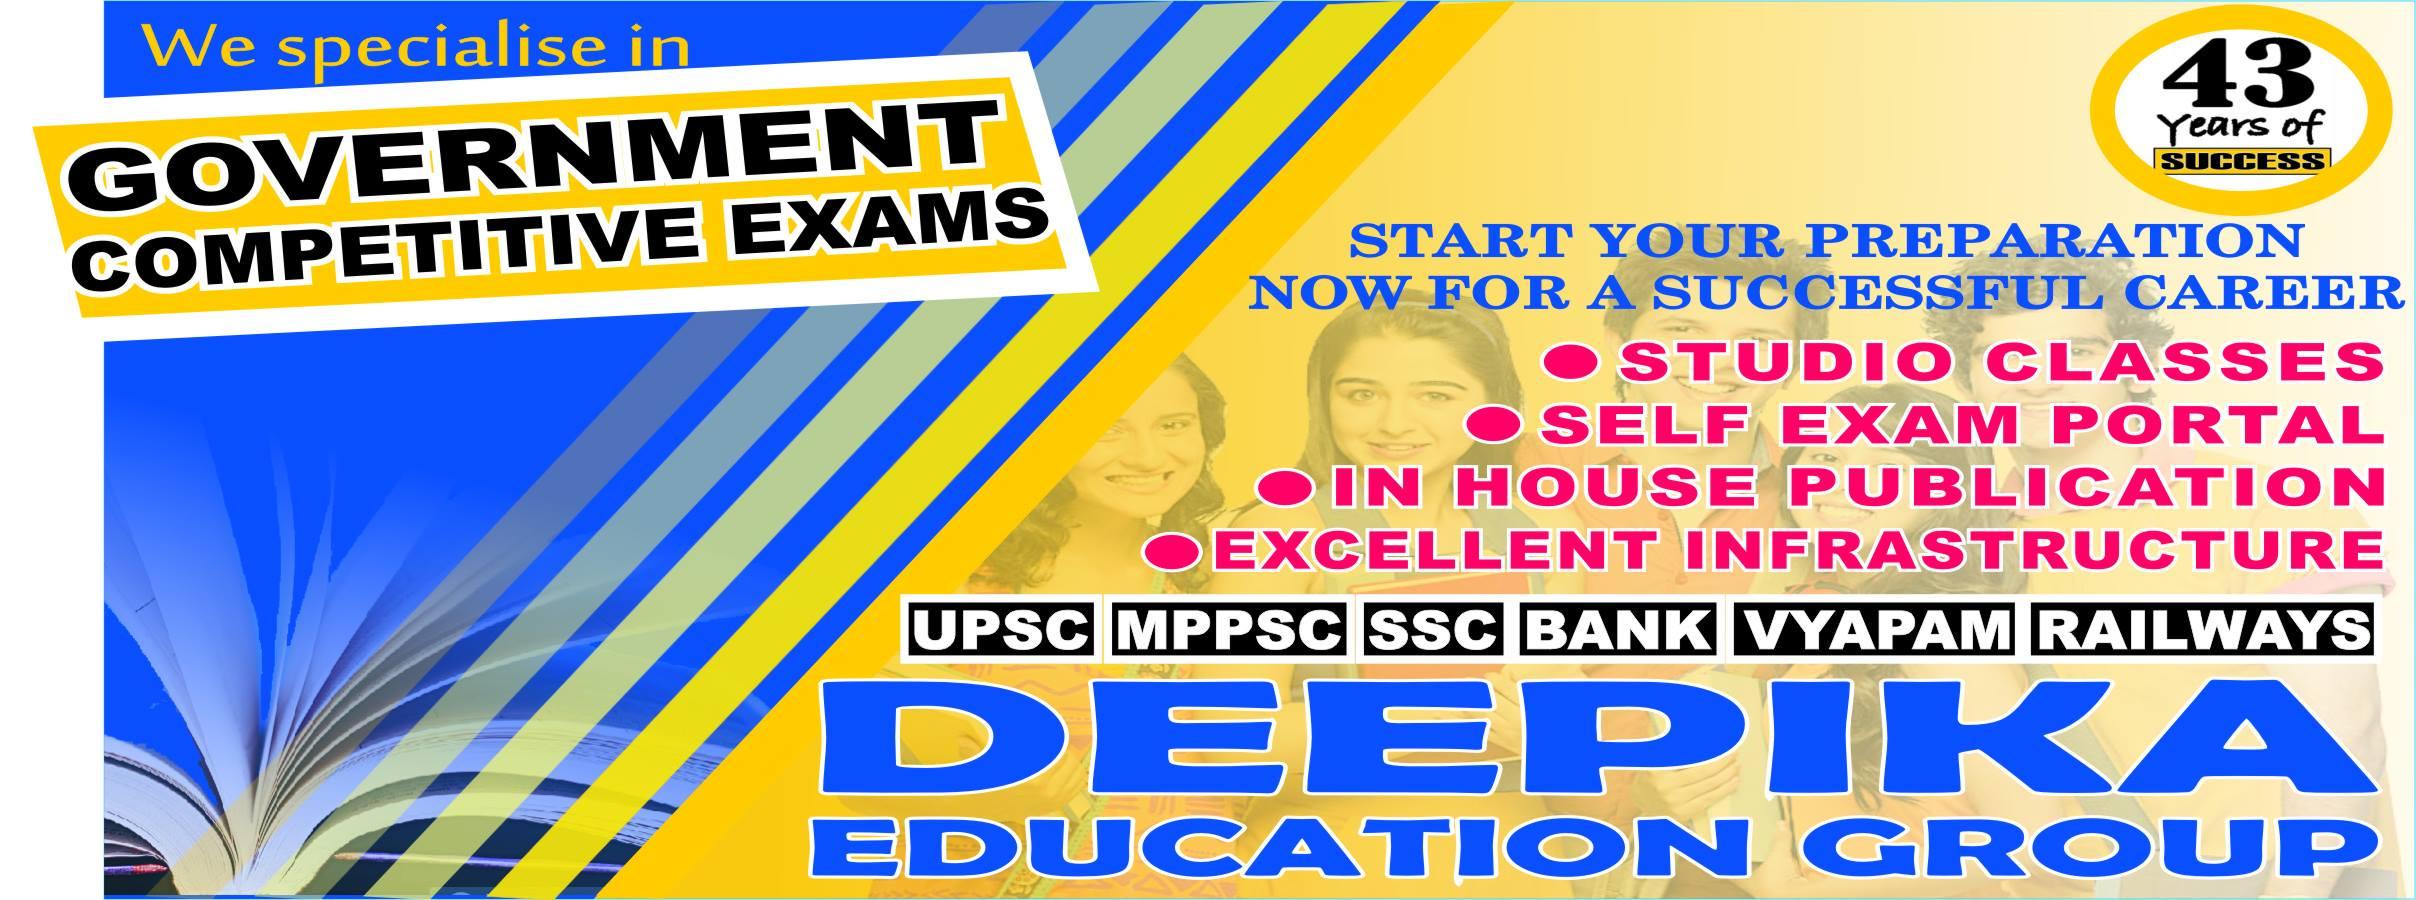 Best IAS Academy In Jabalpur | Deepika Classes | Best IAS Academy In Jabalpur, MPPSC coaching Academy in Jabalpur, best PSC coaching after 12 in Jabalpur, Civil service coaching centers in Jabalpur, UPSC coaching in Jabalpur, best UPPSC classes  - GL43735